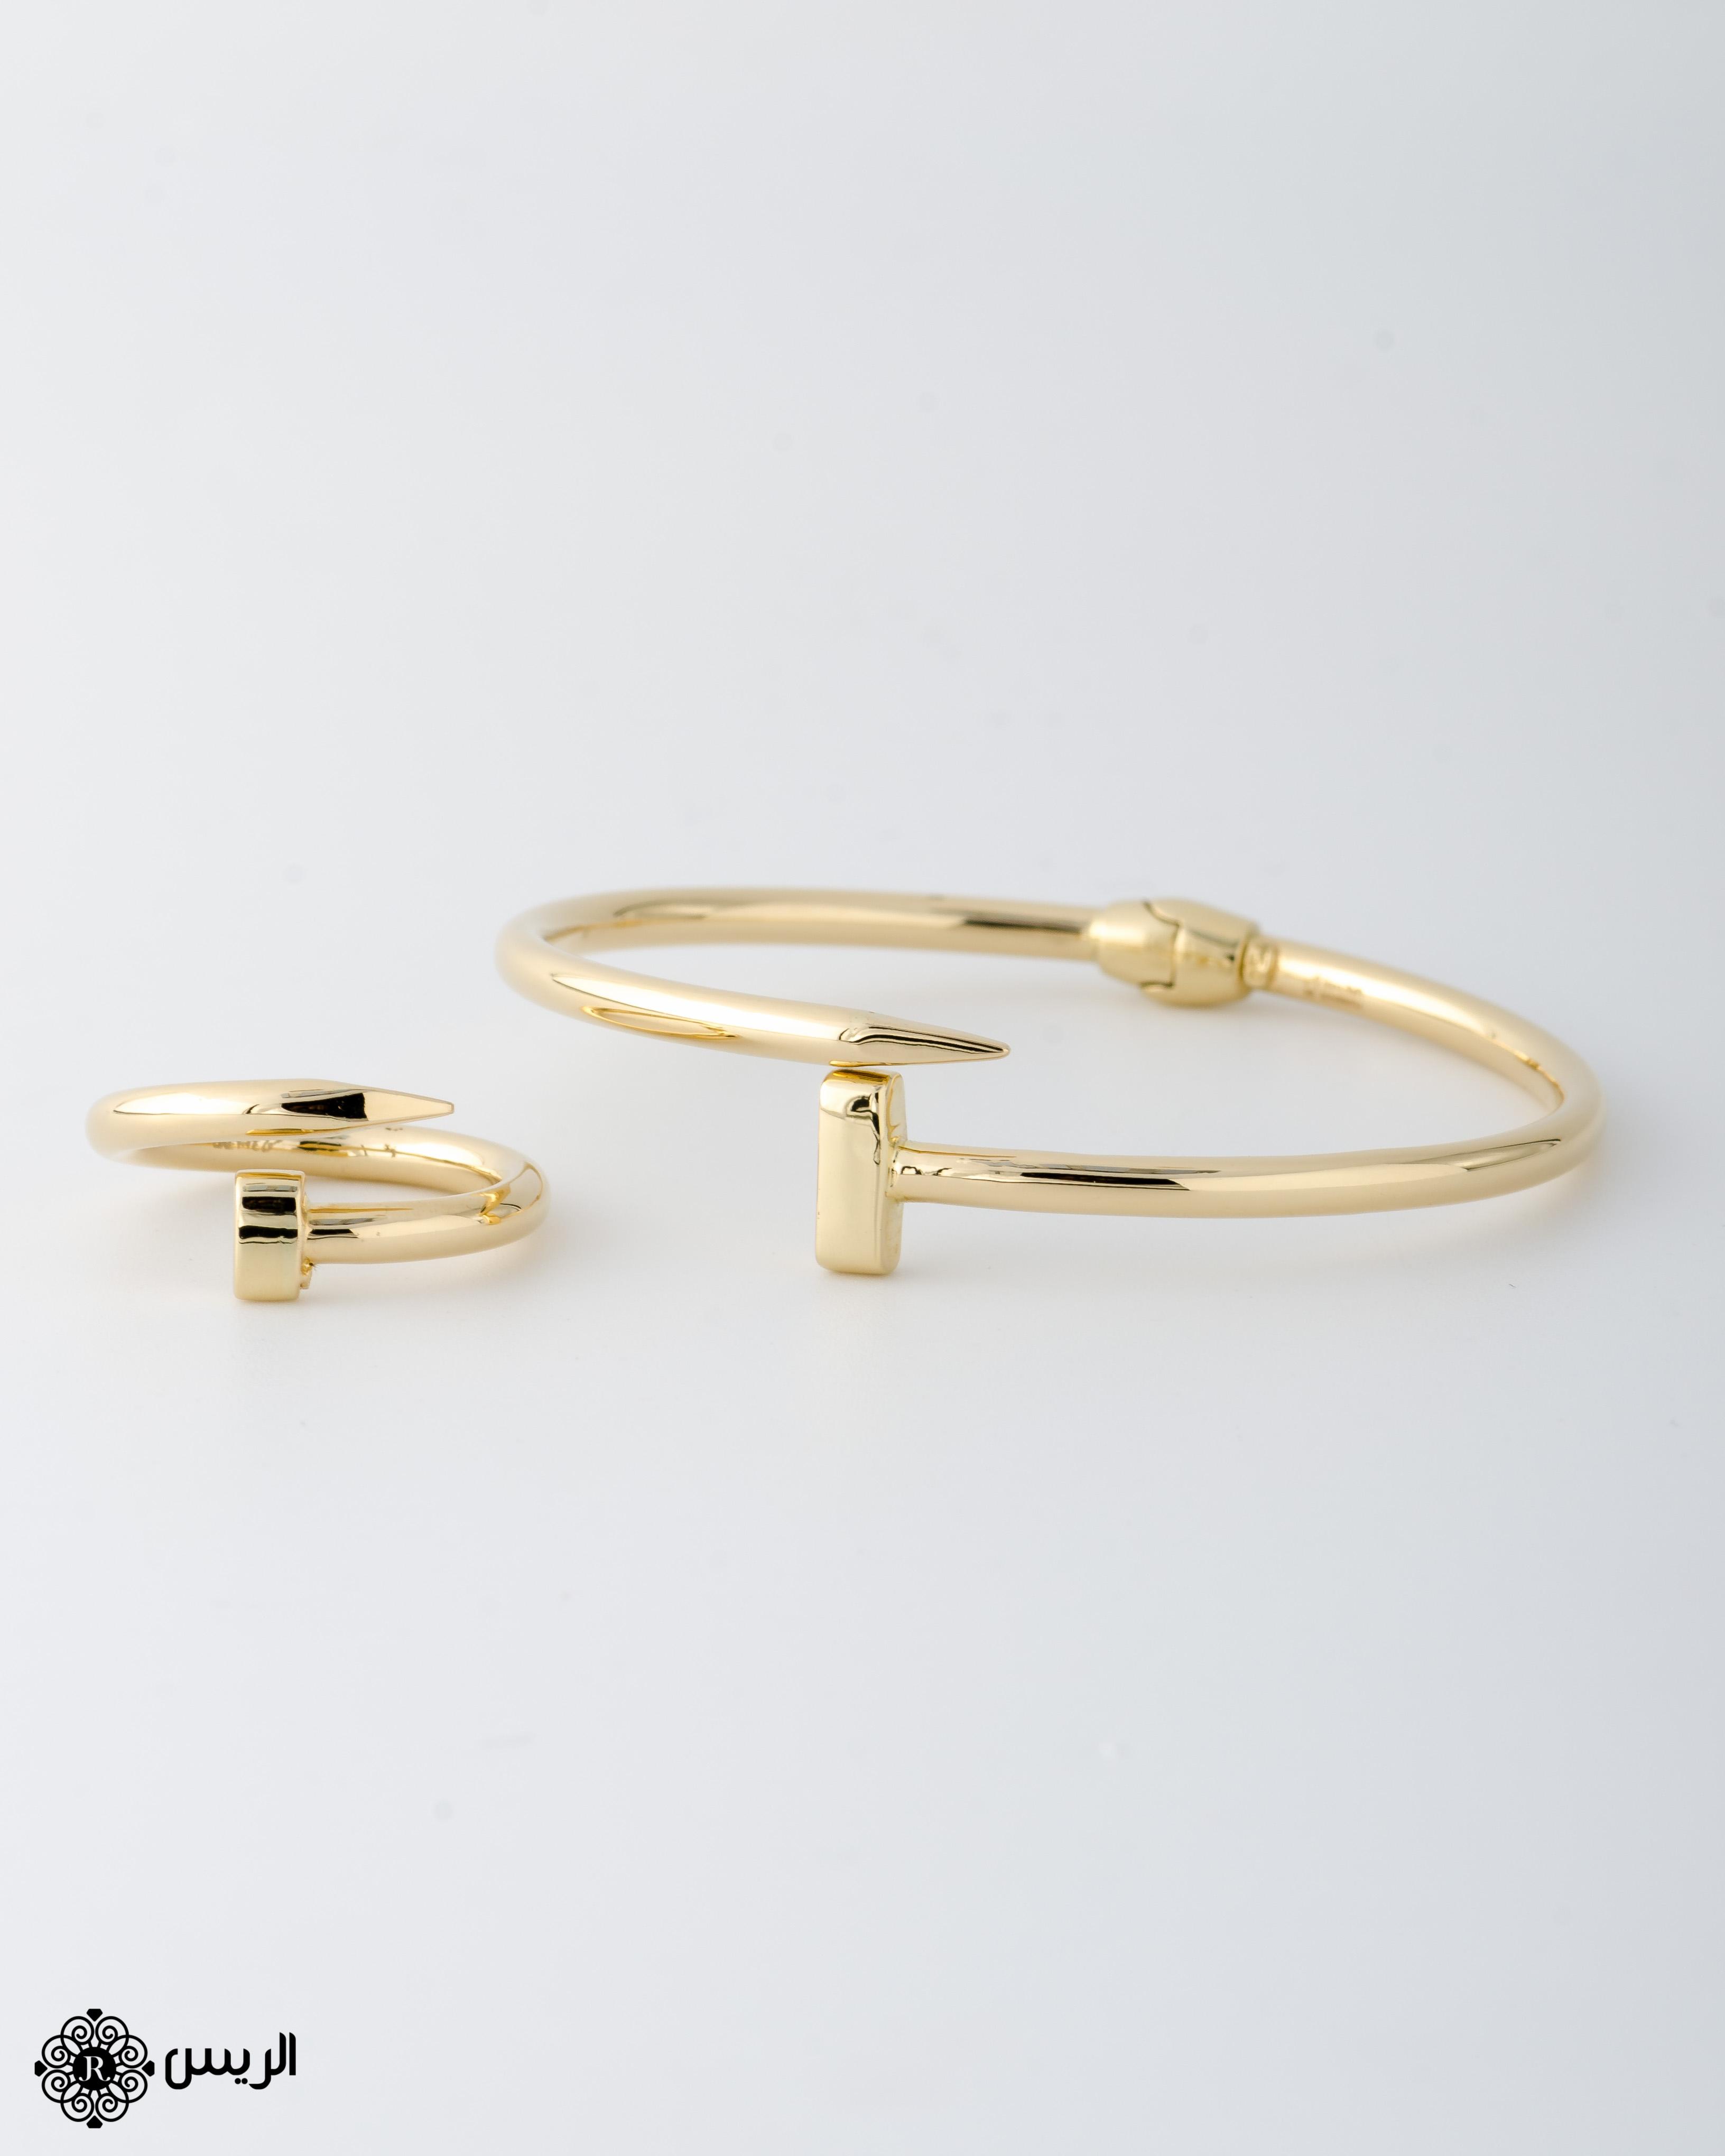 Raies jewelry Bangle with Ring إسورة مسمار مع خاتم الريس للمجوهرات